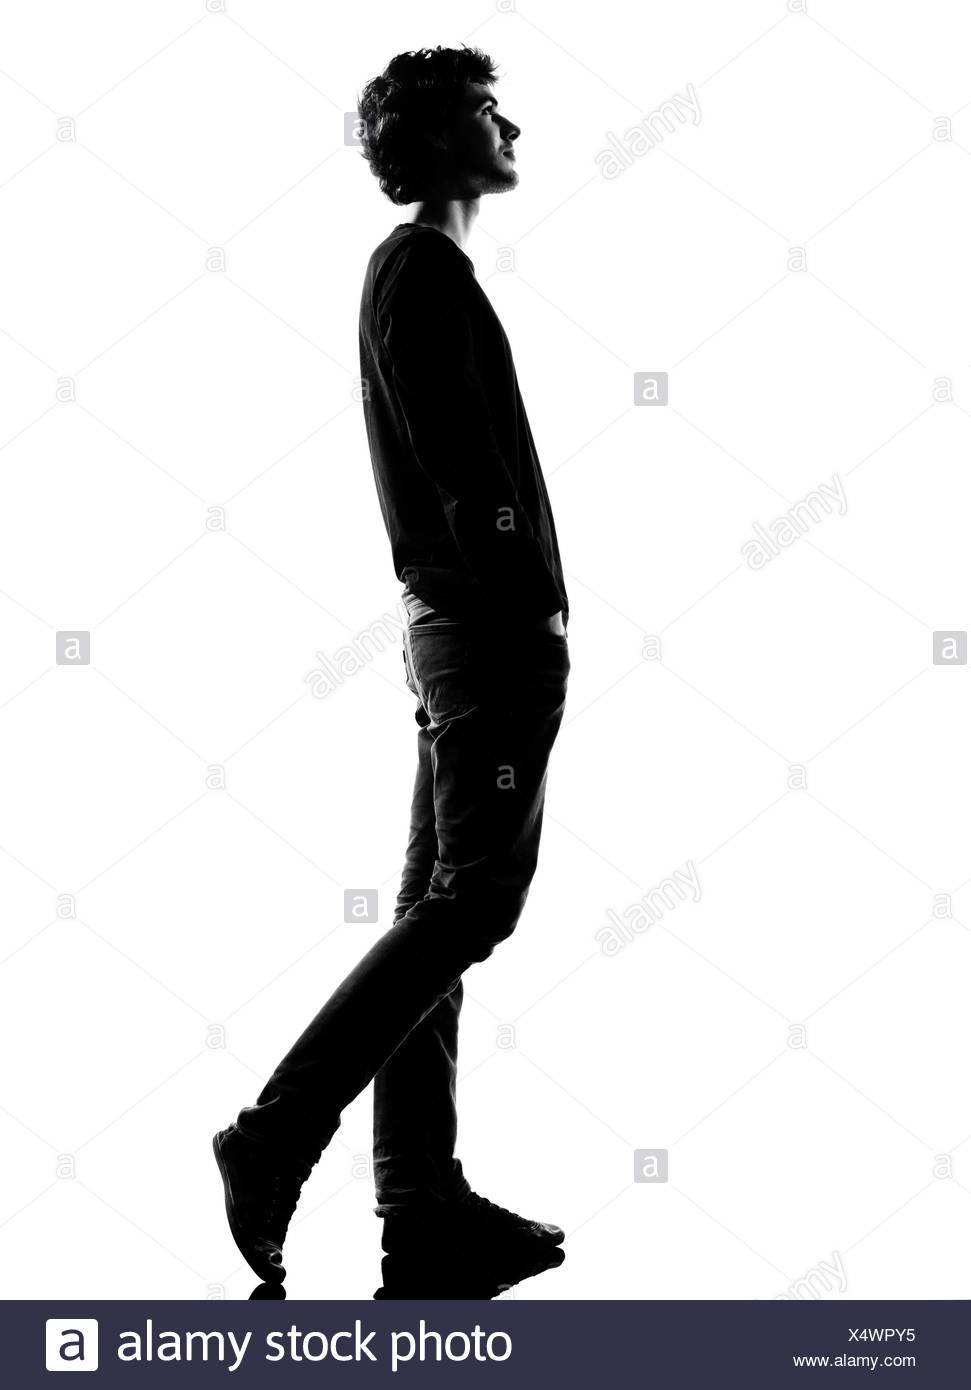 971x1390 Walking Man Silhouette Side View Black And White Stock Photos